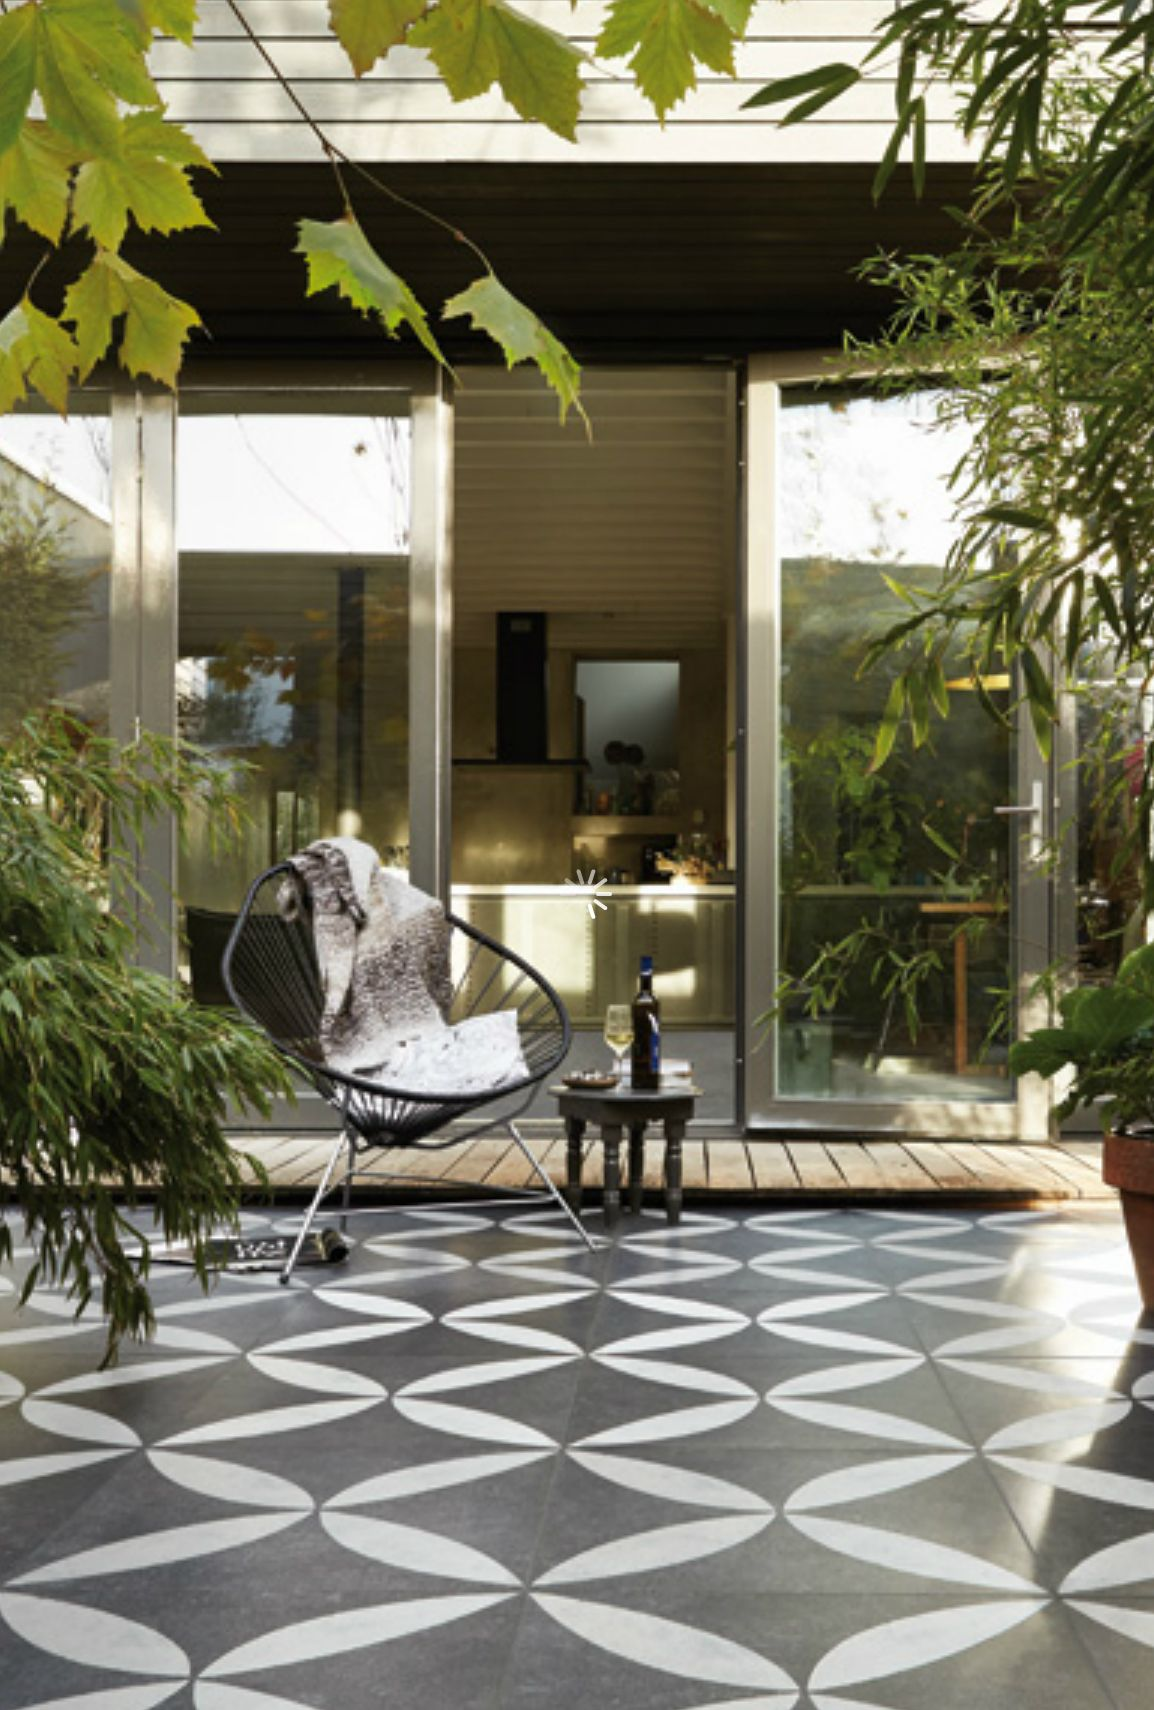 Patio Deck Tiles Recycled Rubber: VT Wonen Buitentegels